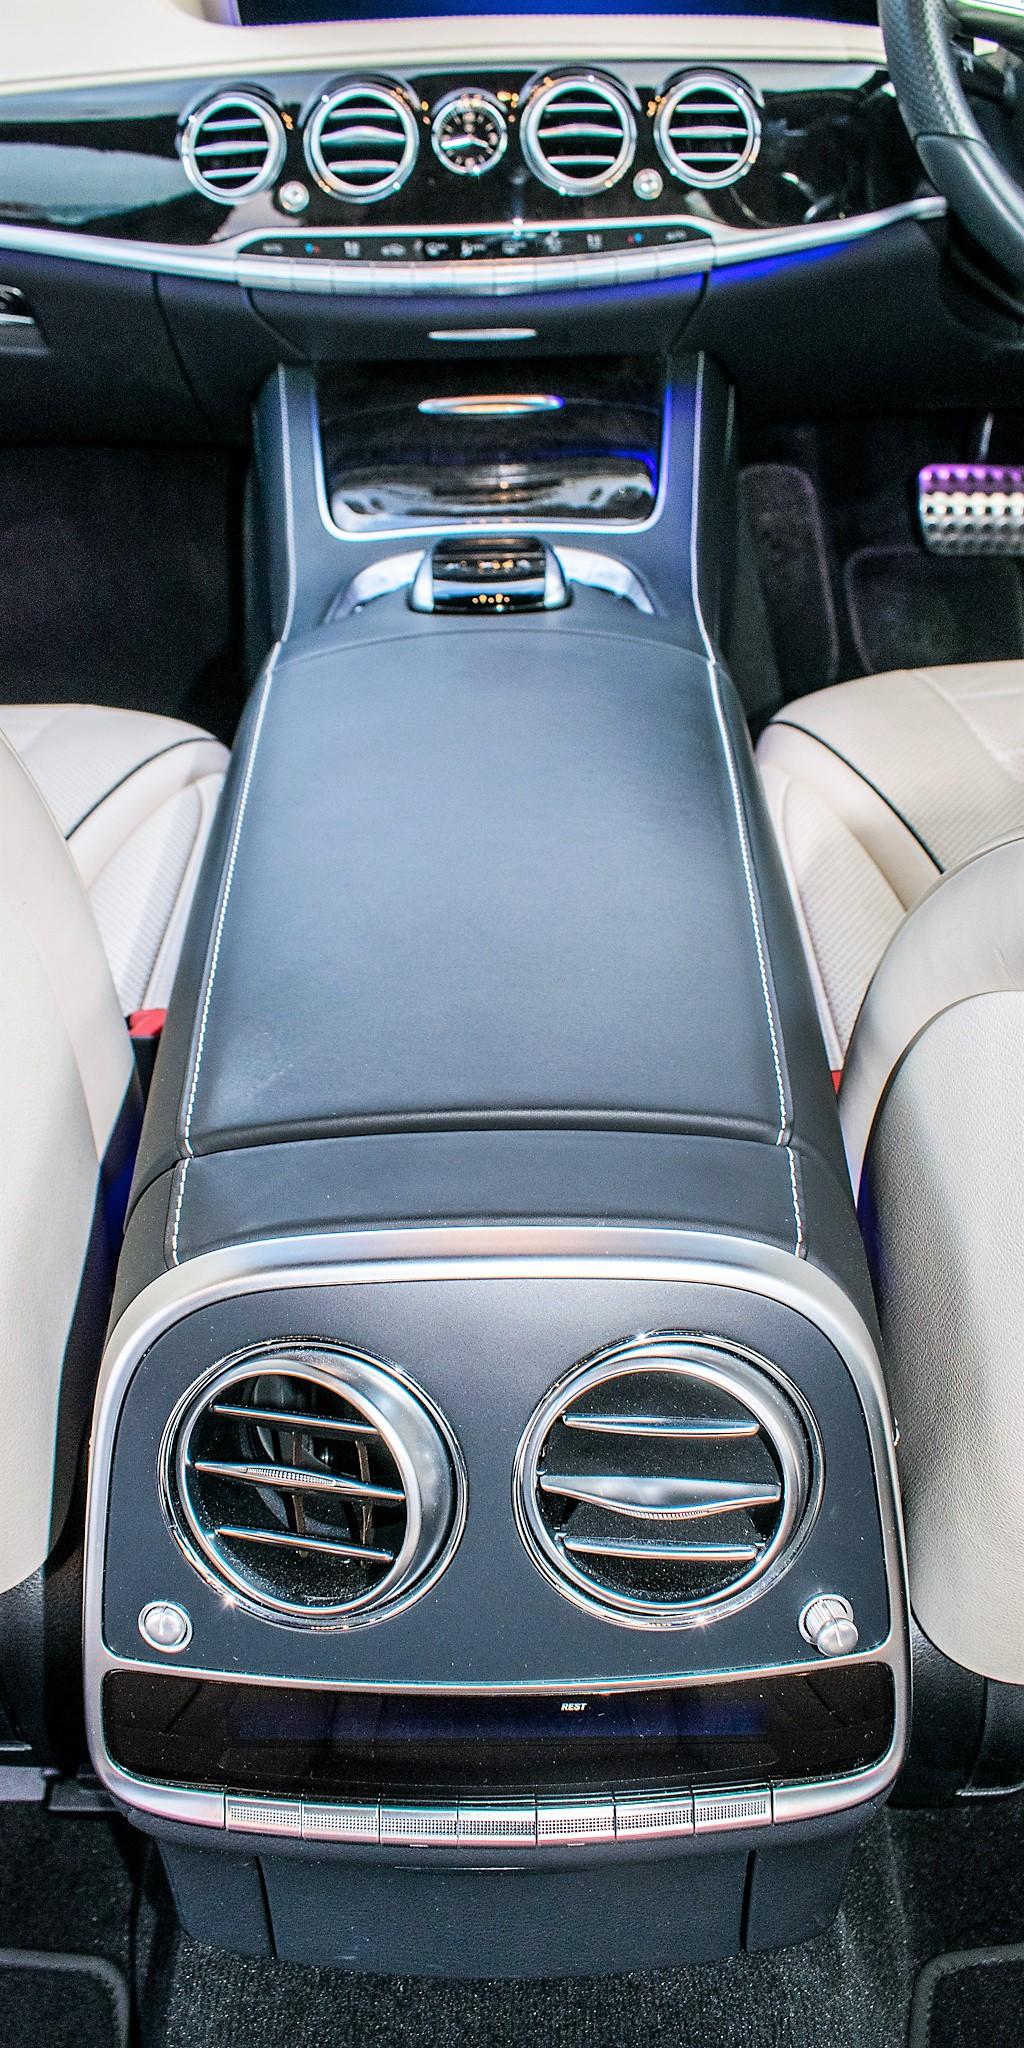 Mercedes Benz S450 L AMG Line Executive auto petrol 4 door saloon car Registration Number: FX68 - Image 29 of 33